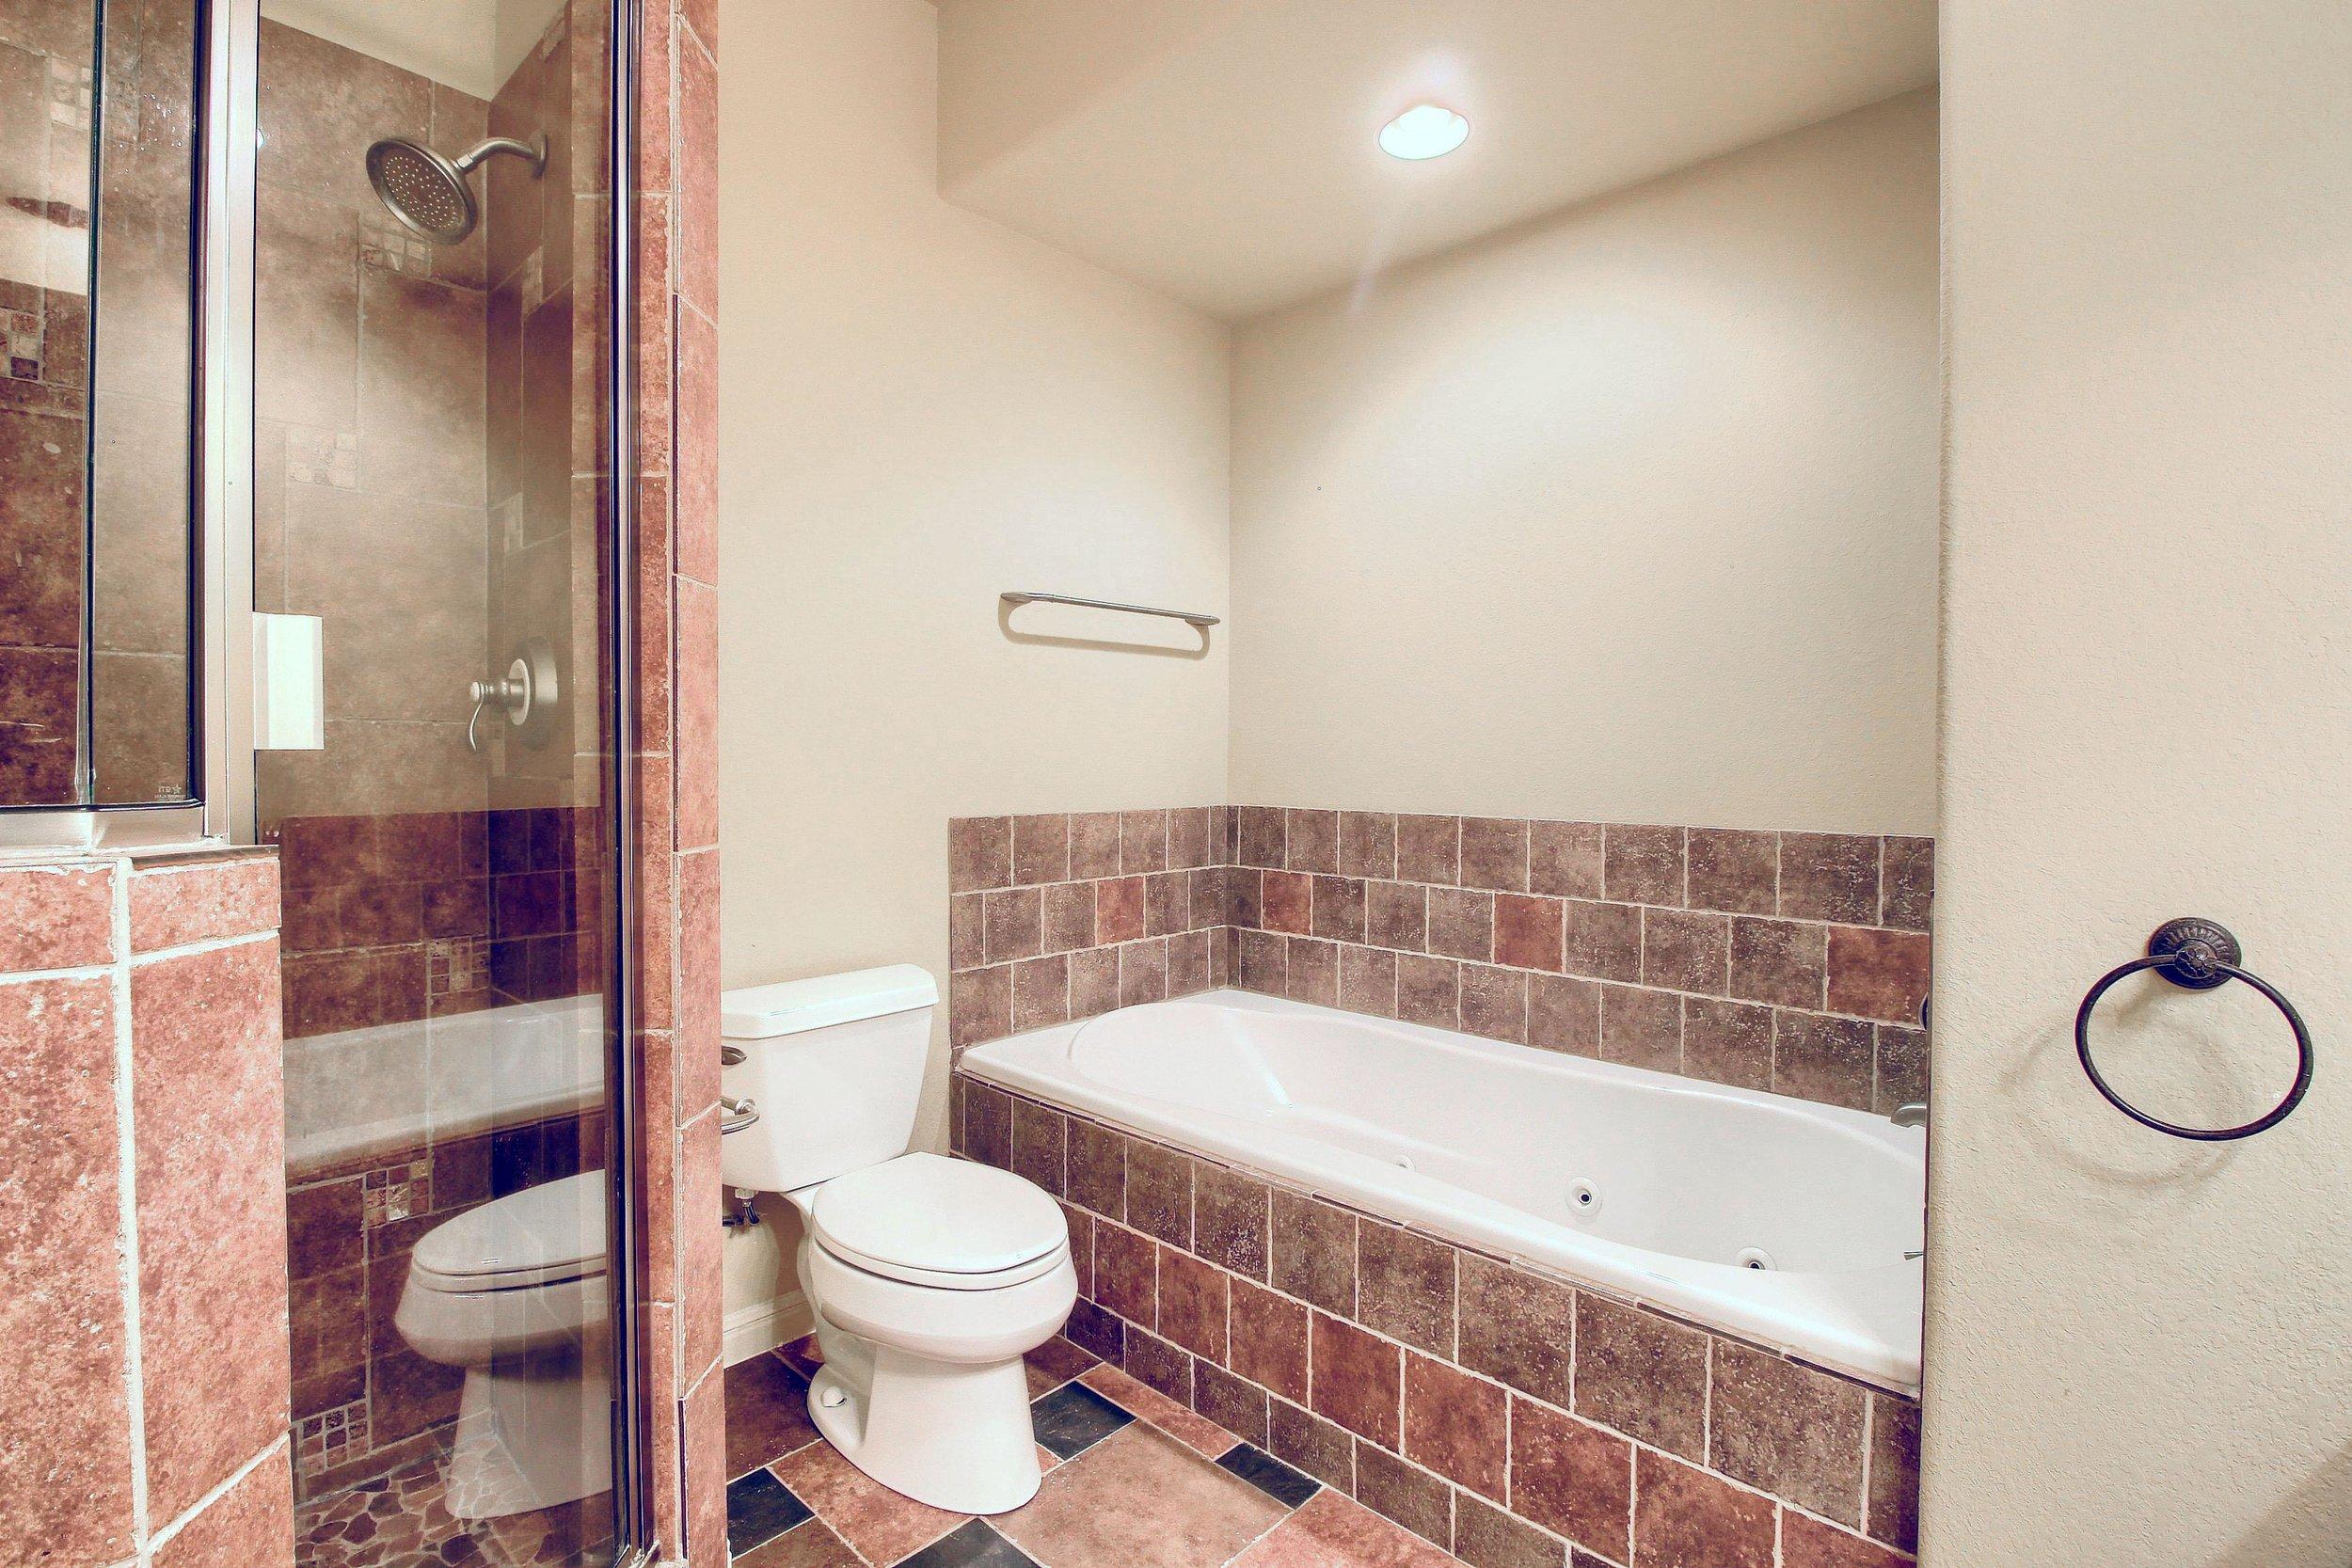 05_Master_Bathroom_IMG_1016.JPG